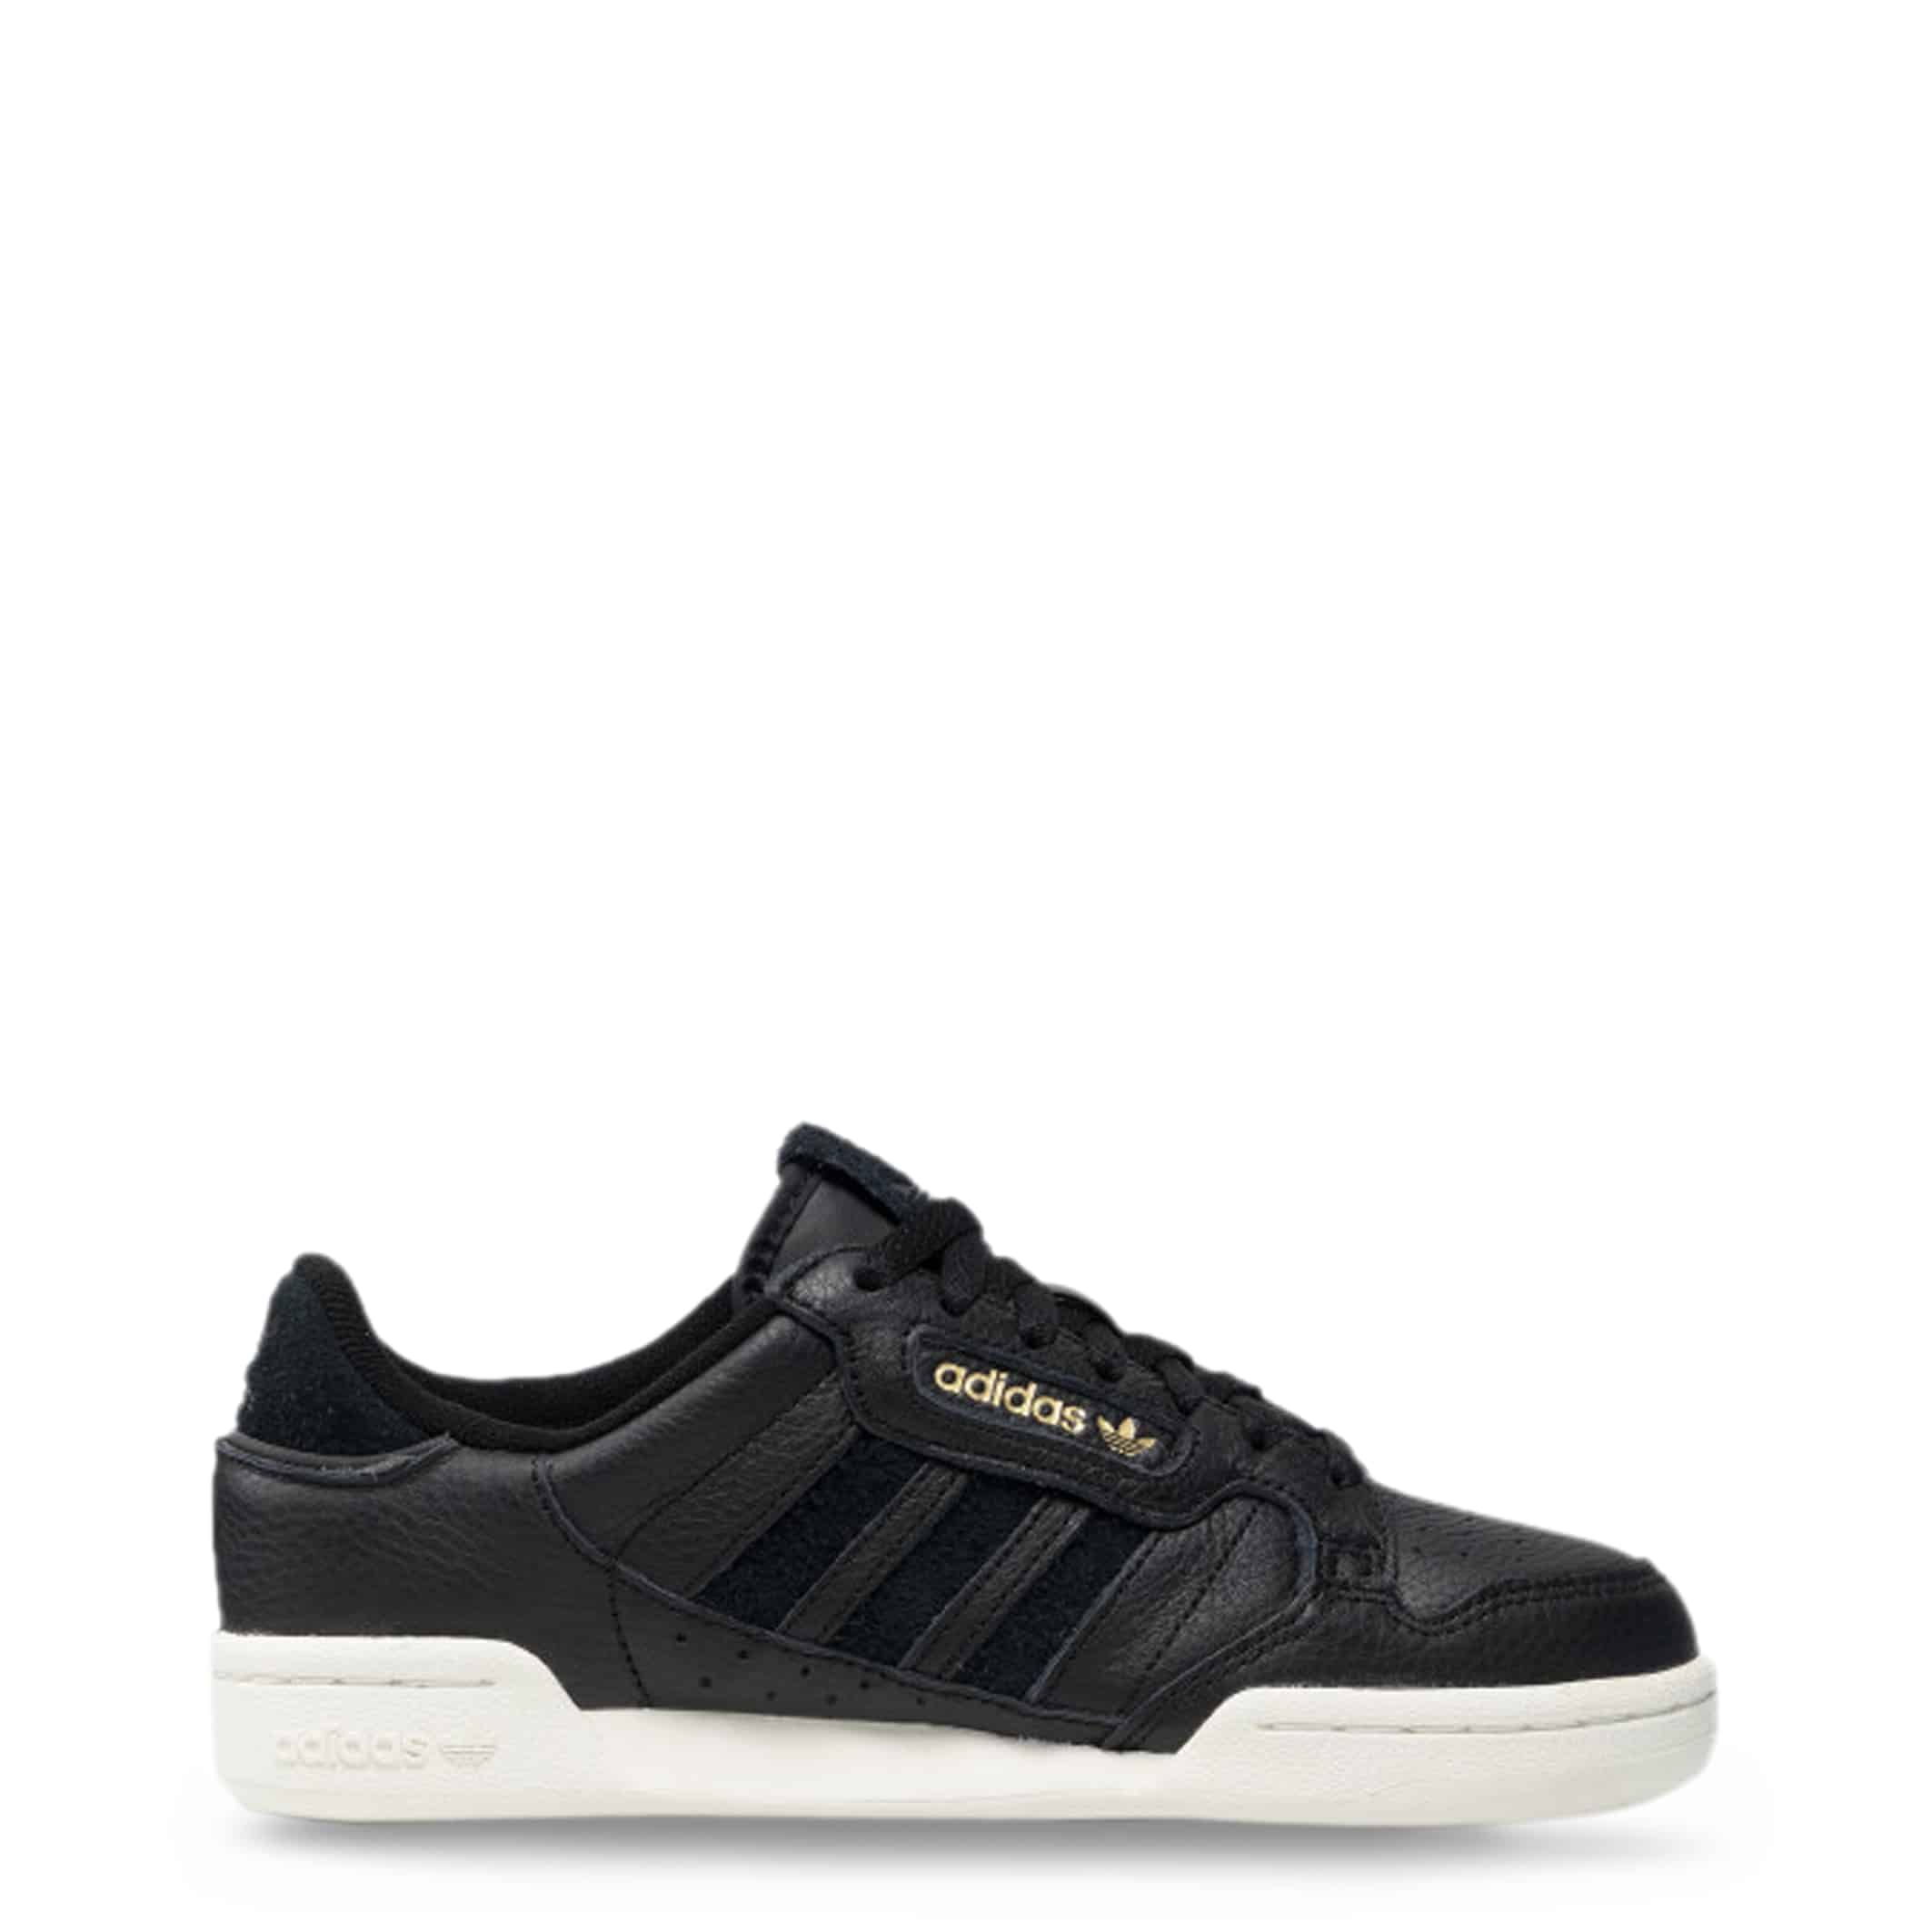 Adidas – Continental80-Stripes – Zwart Designeritems.nl